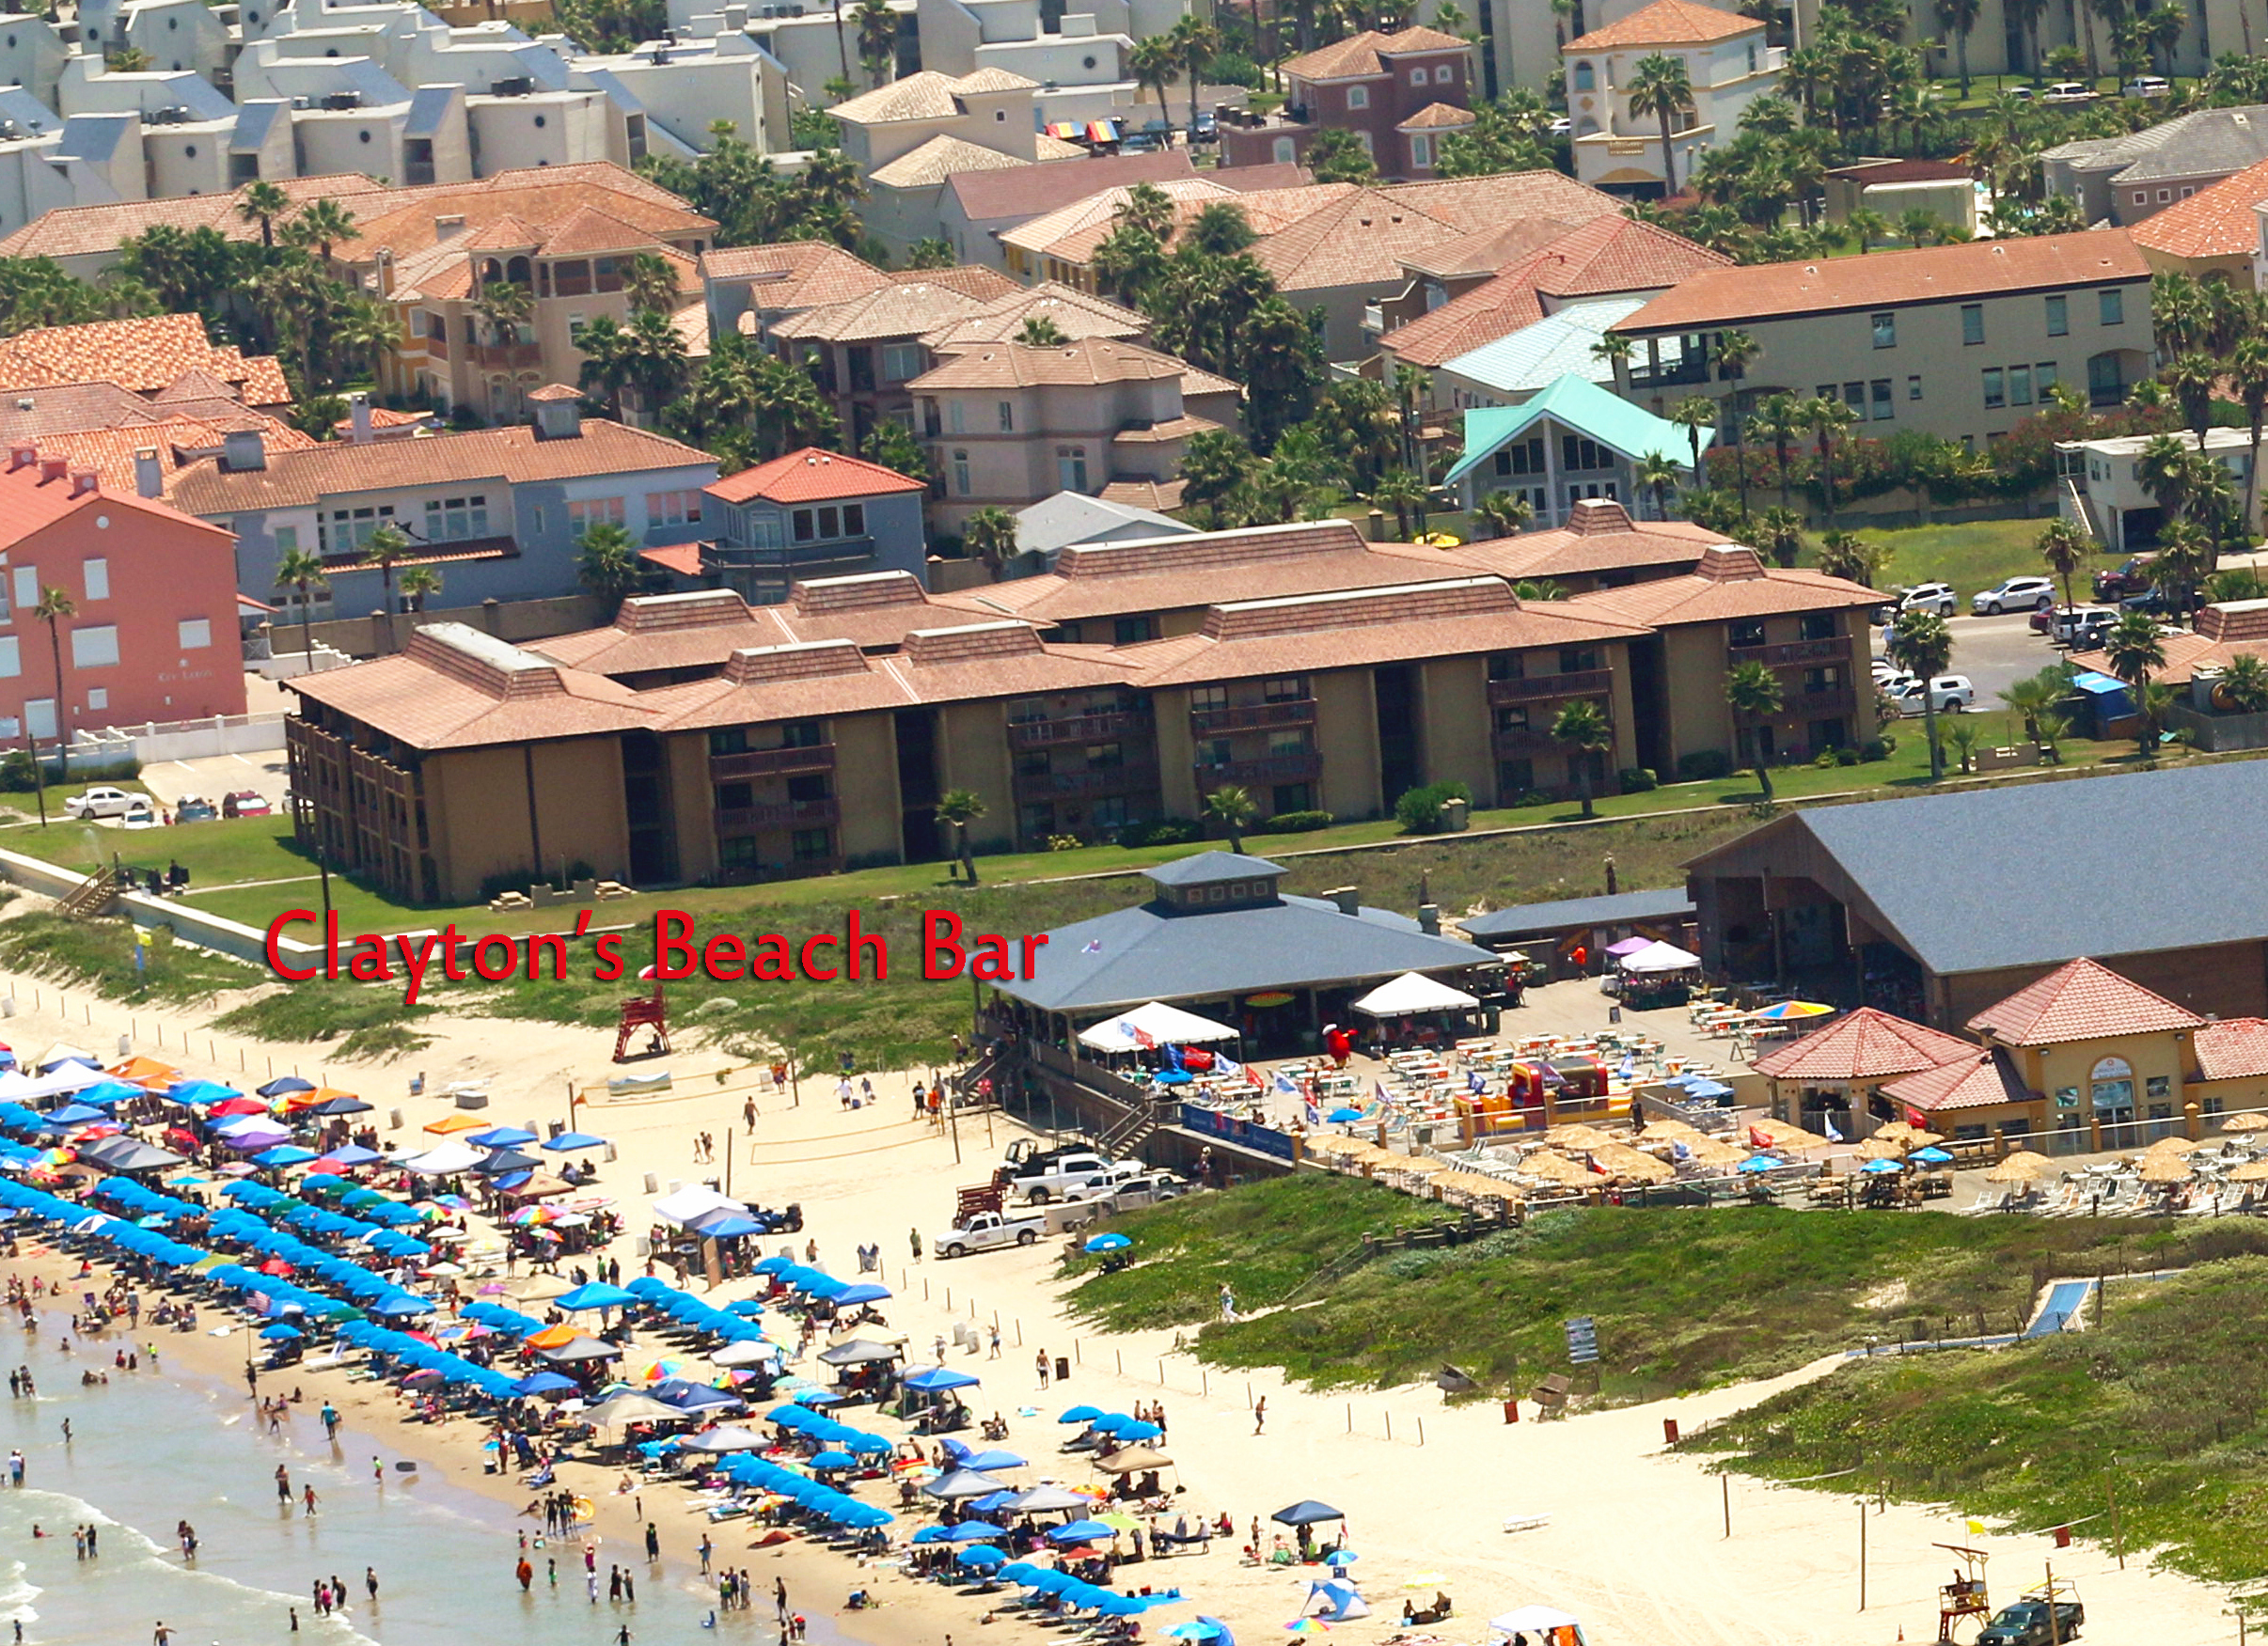 Clayton's Beach Bar